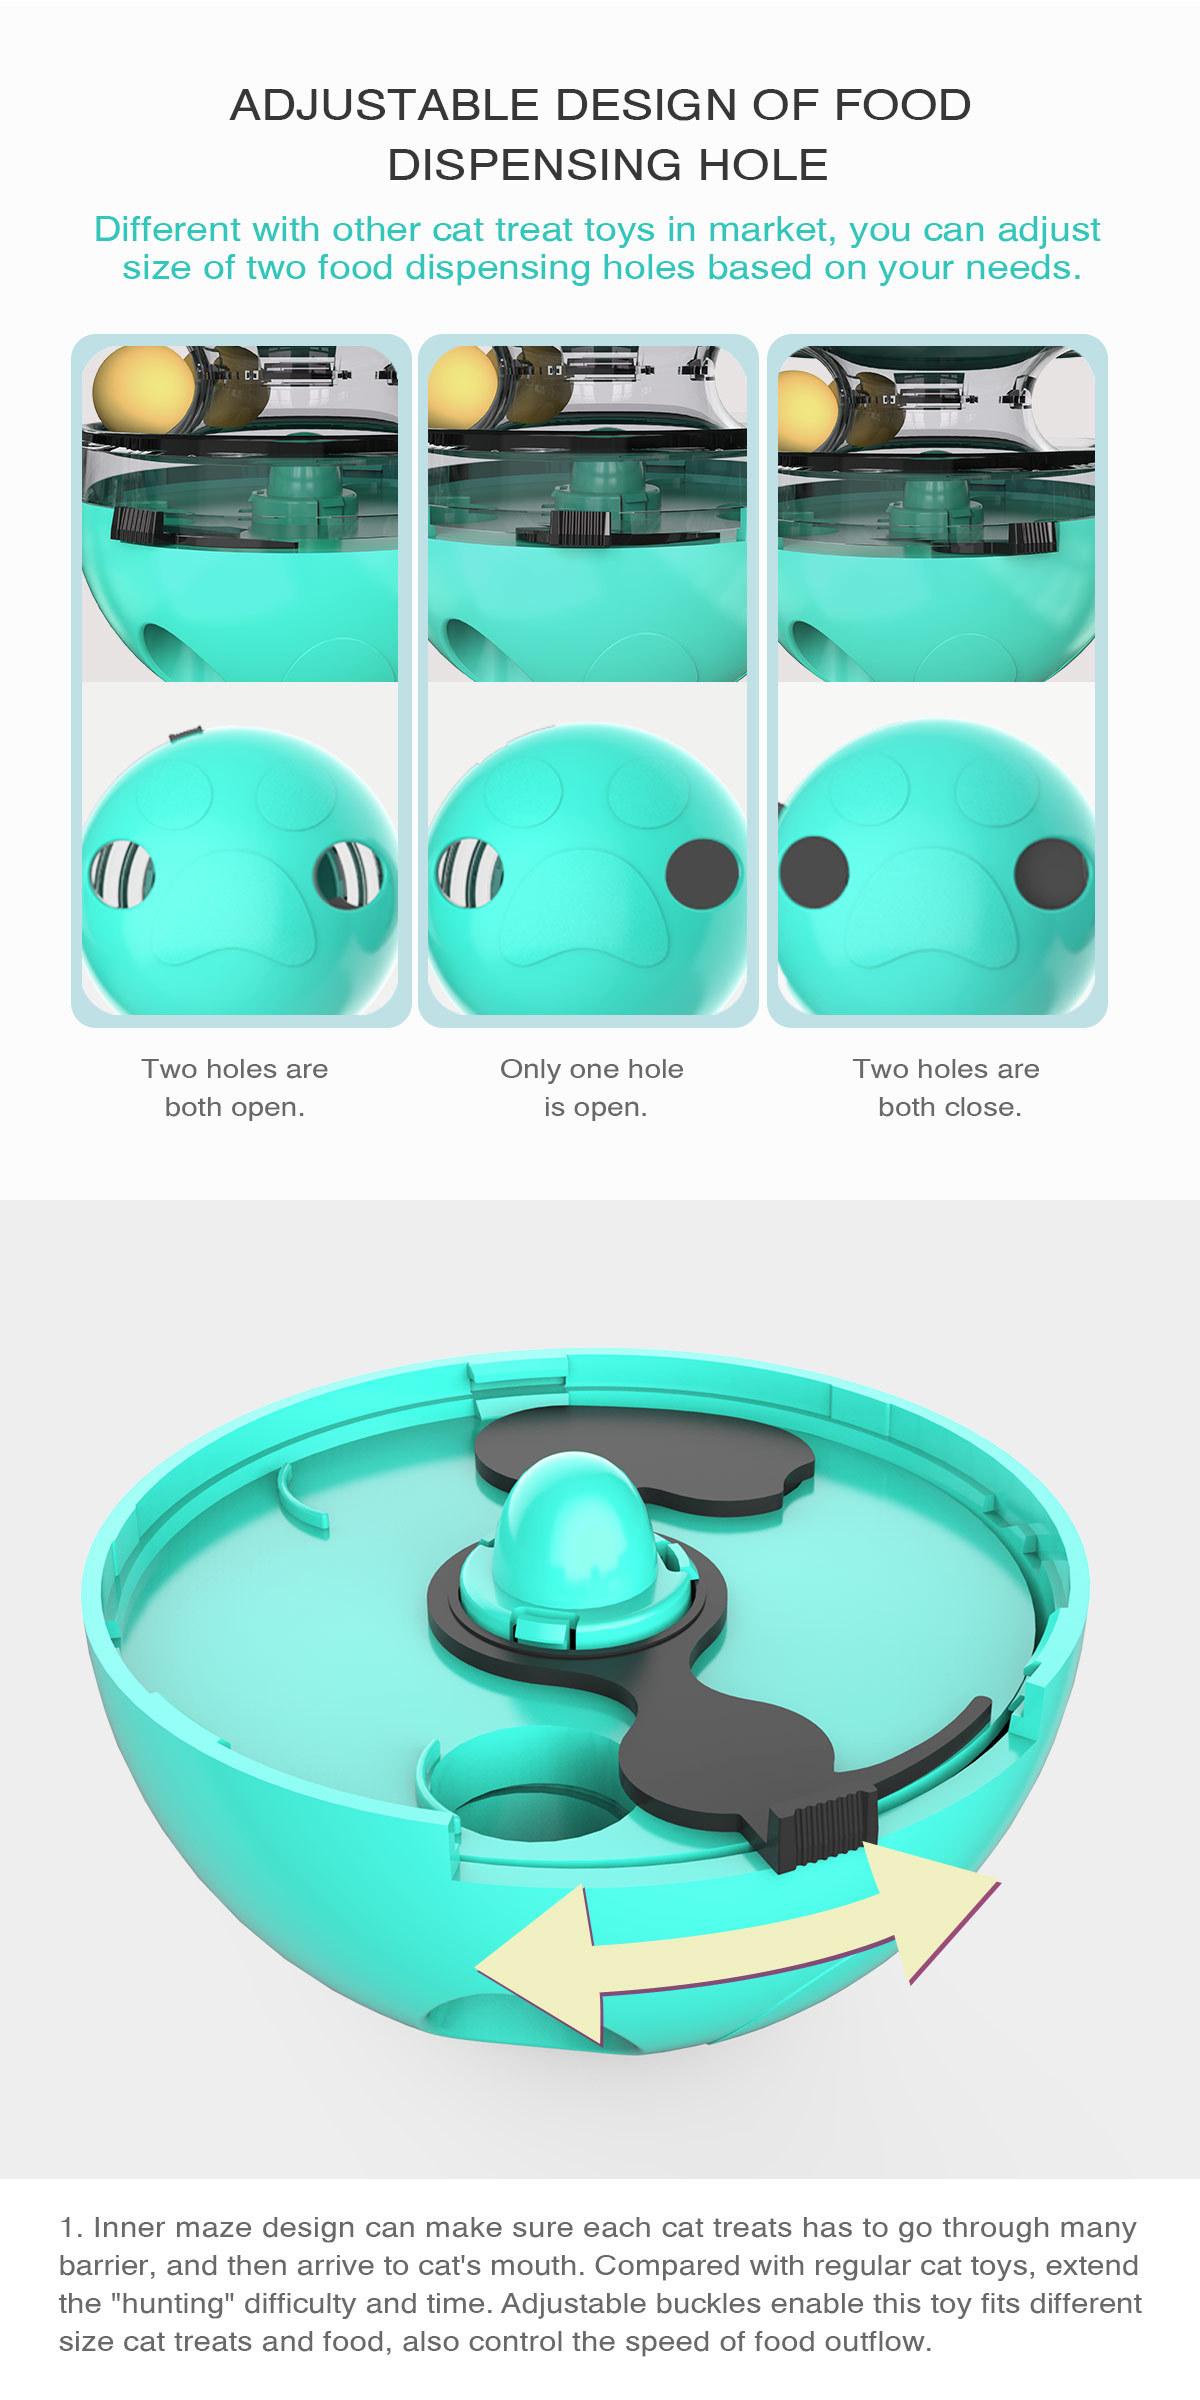 Pet Supplies Shake Cat Toy Teasing Cat Stick Teasing Artifact Track Ball Does Not Spill Food Ball MOQ 30 PCS 1